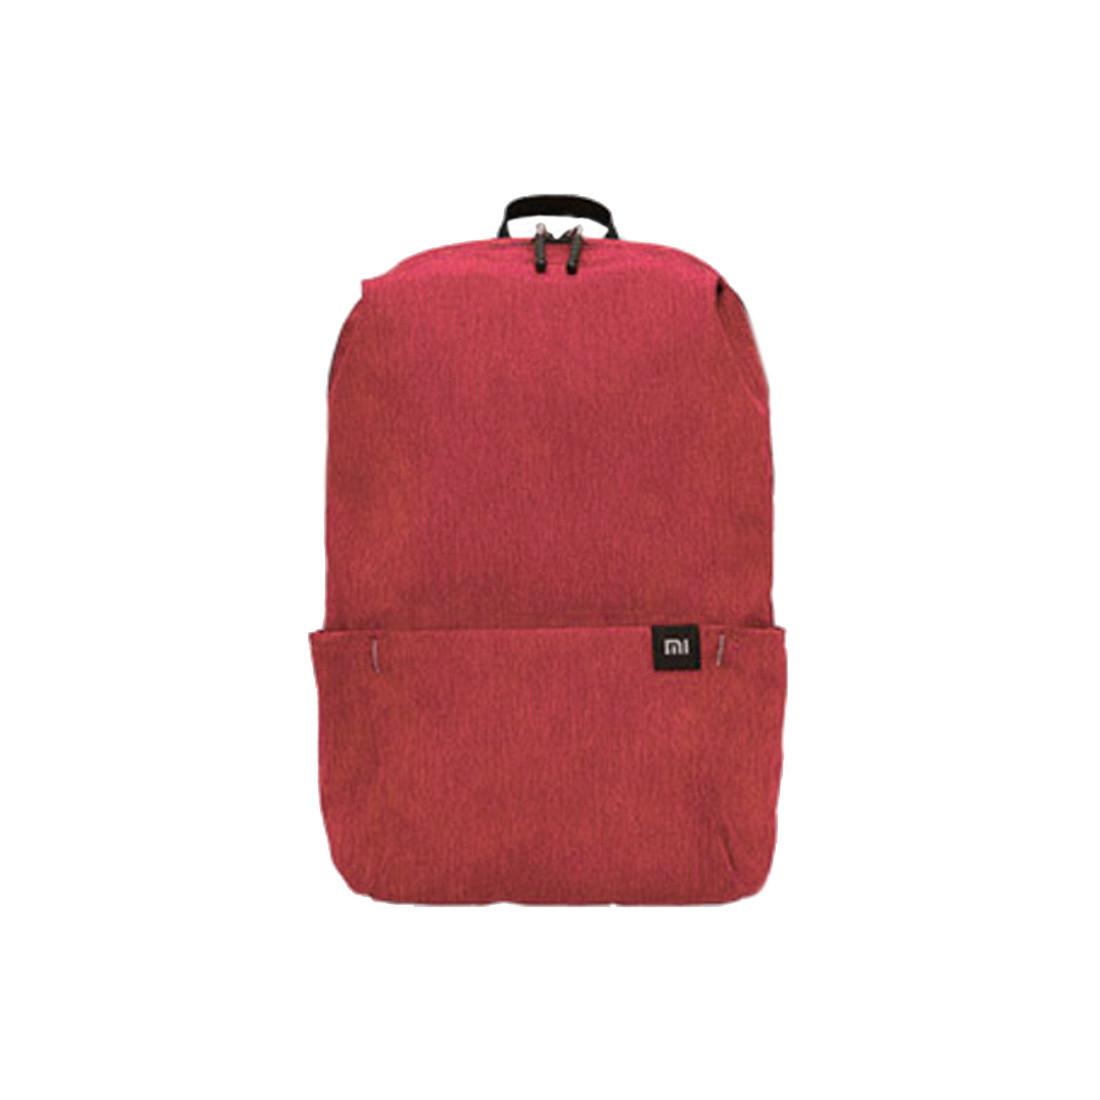 Рюкзак, Xioami, RunMi 90' Points Eight Colors ZJB4137 , 10 л, 34х22.5х13 см, Полиэфирное волокно, Красный